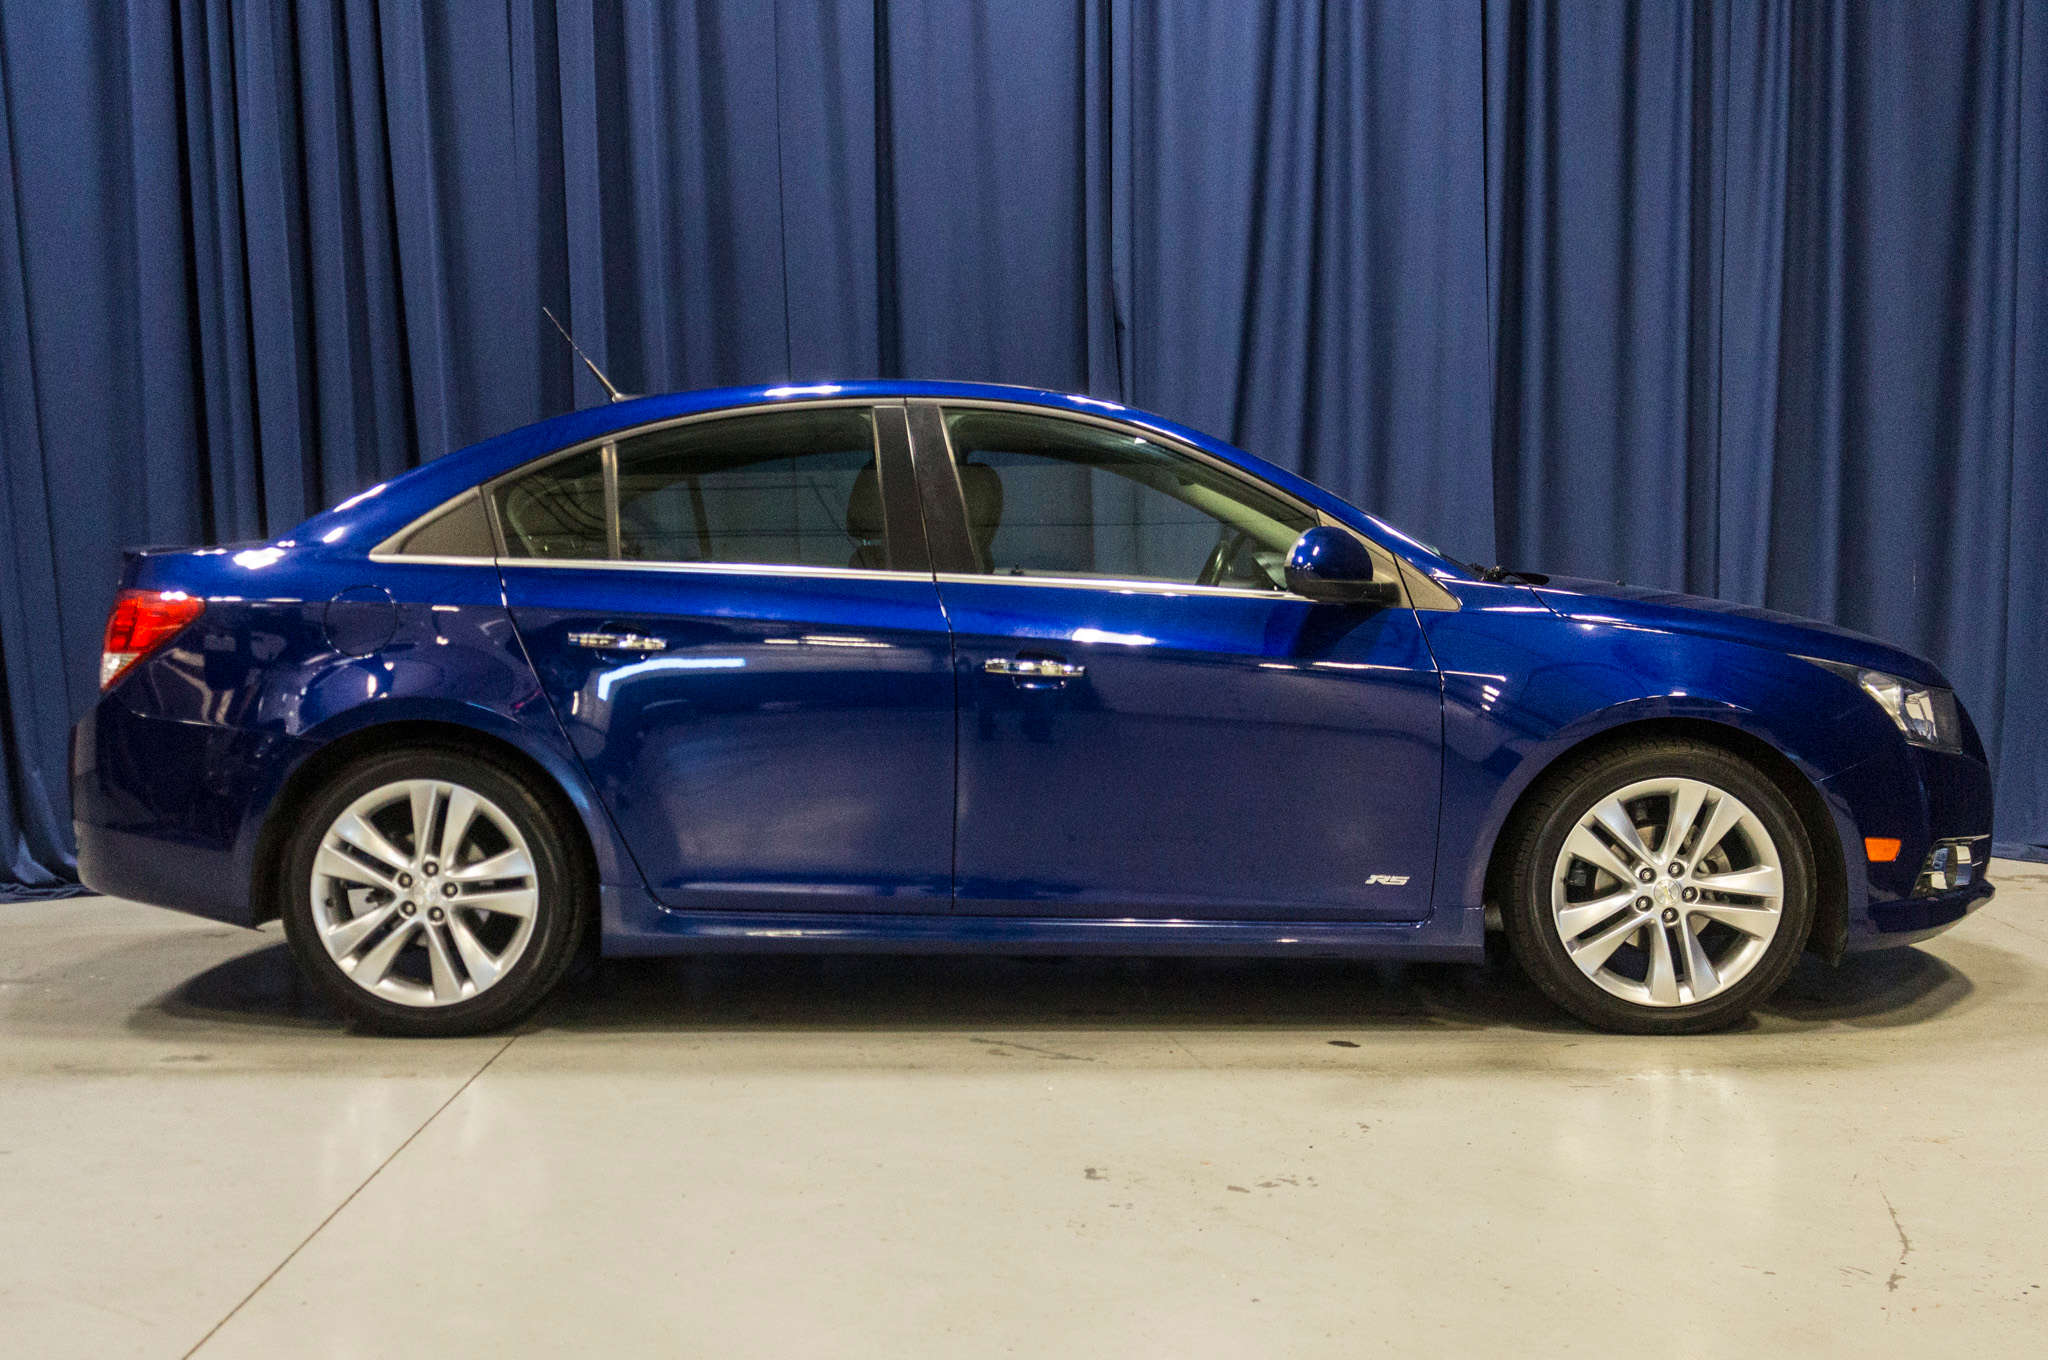 for h cruze sale will news hits diesel it buy chevrolet sedan anyone mpg